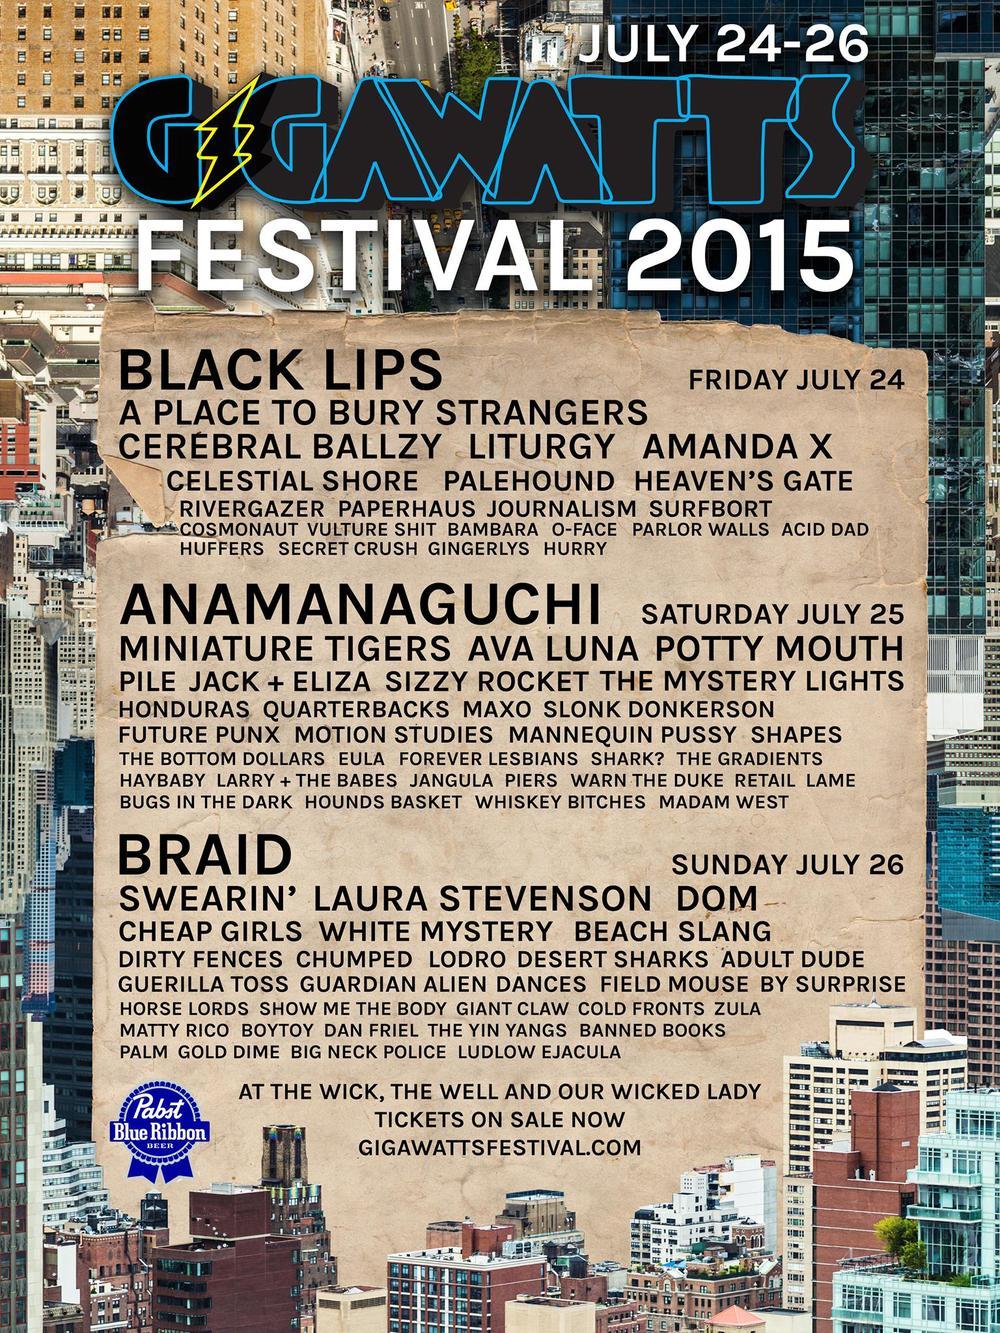 Gigawatts Festival 2015